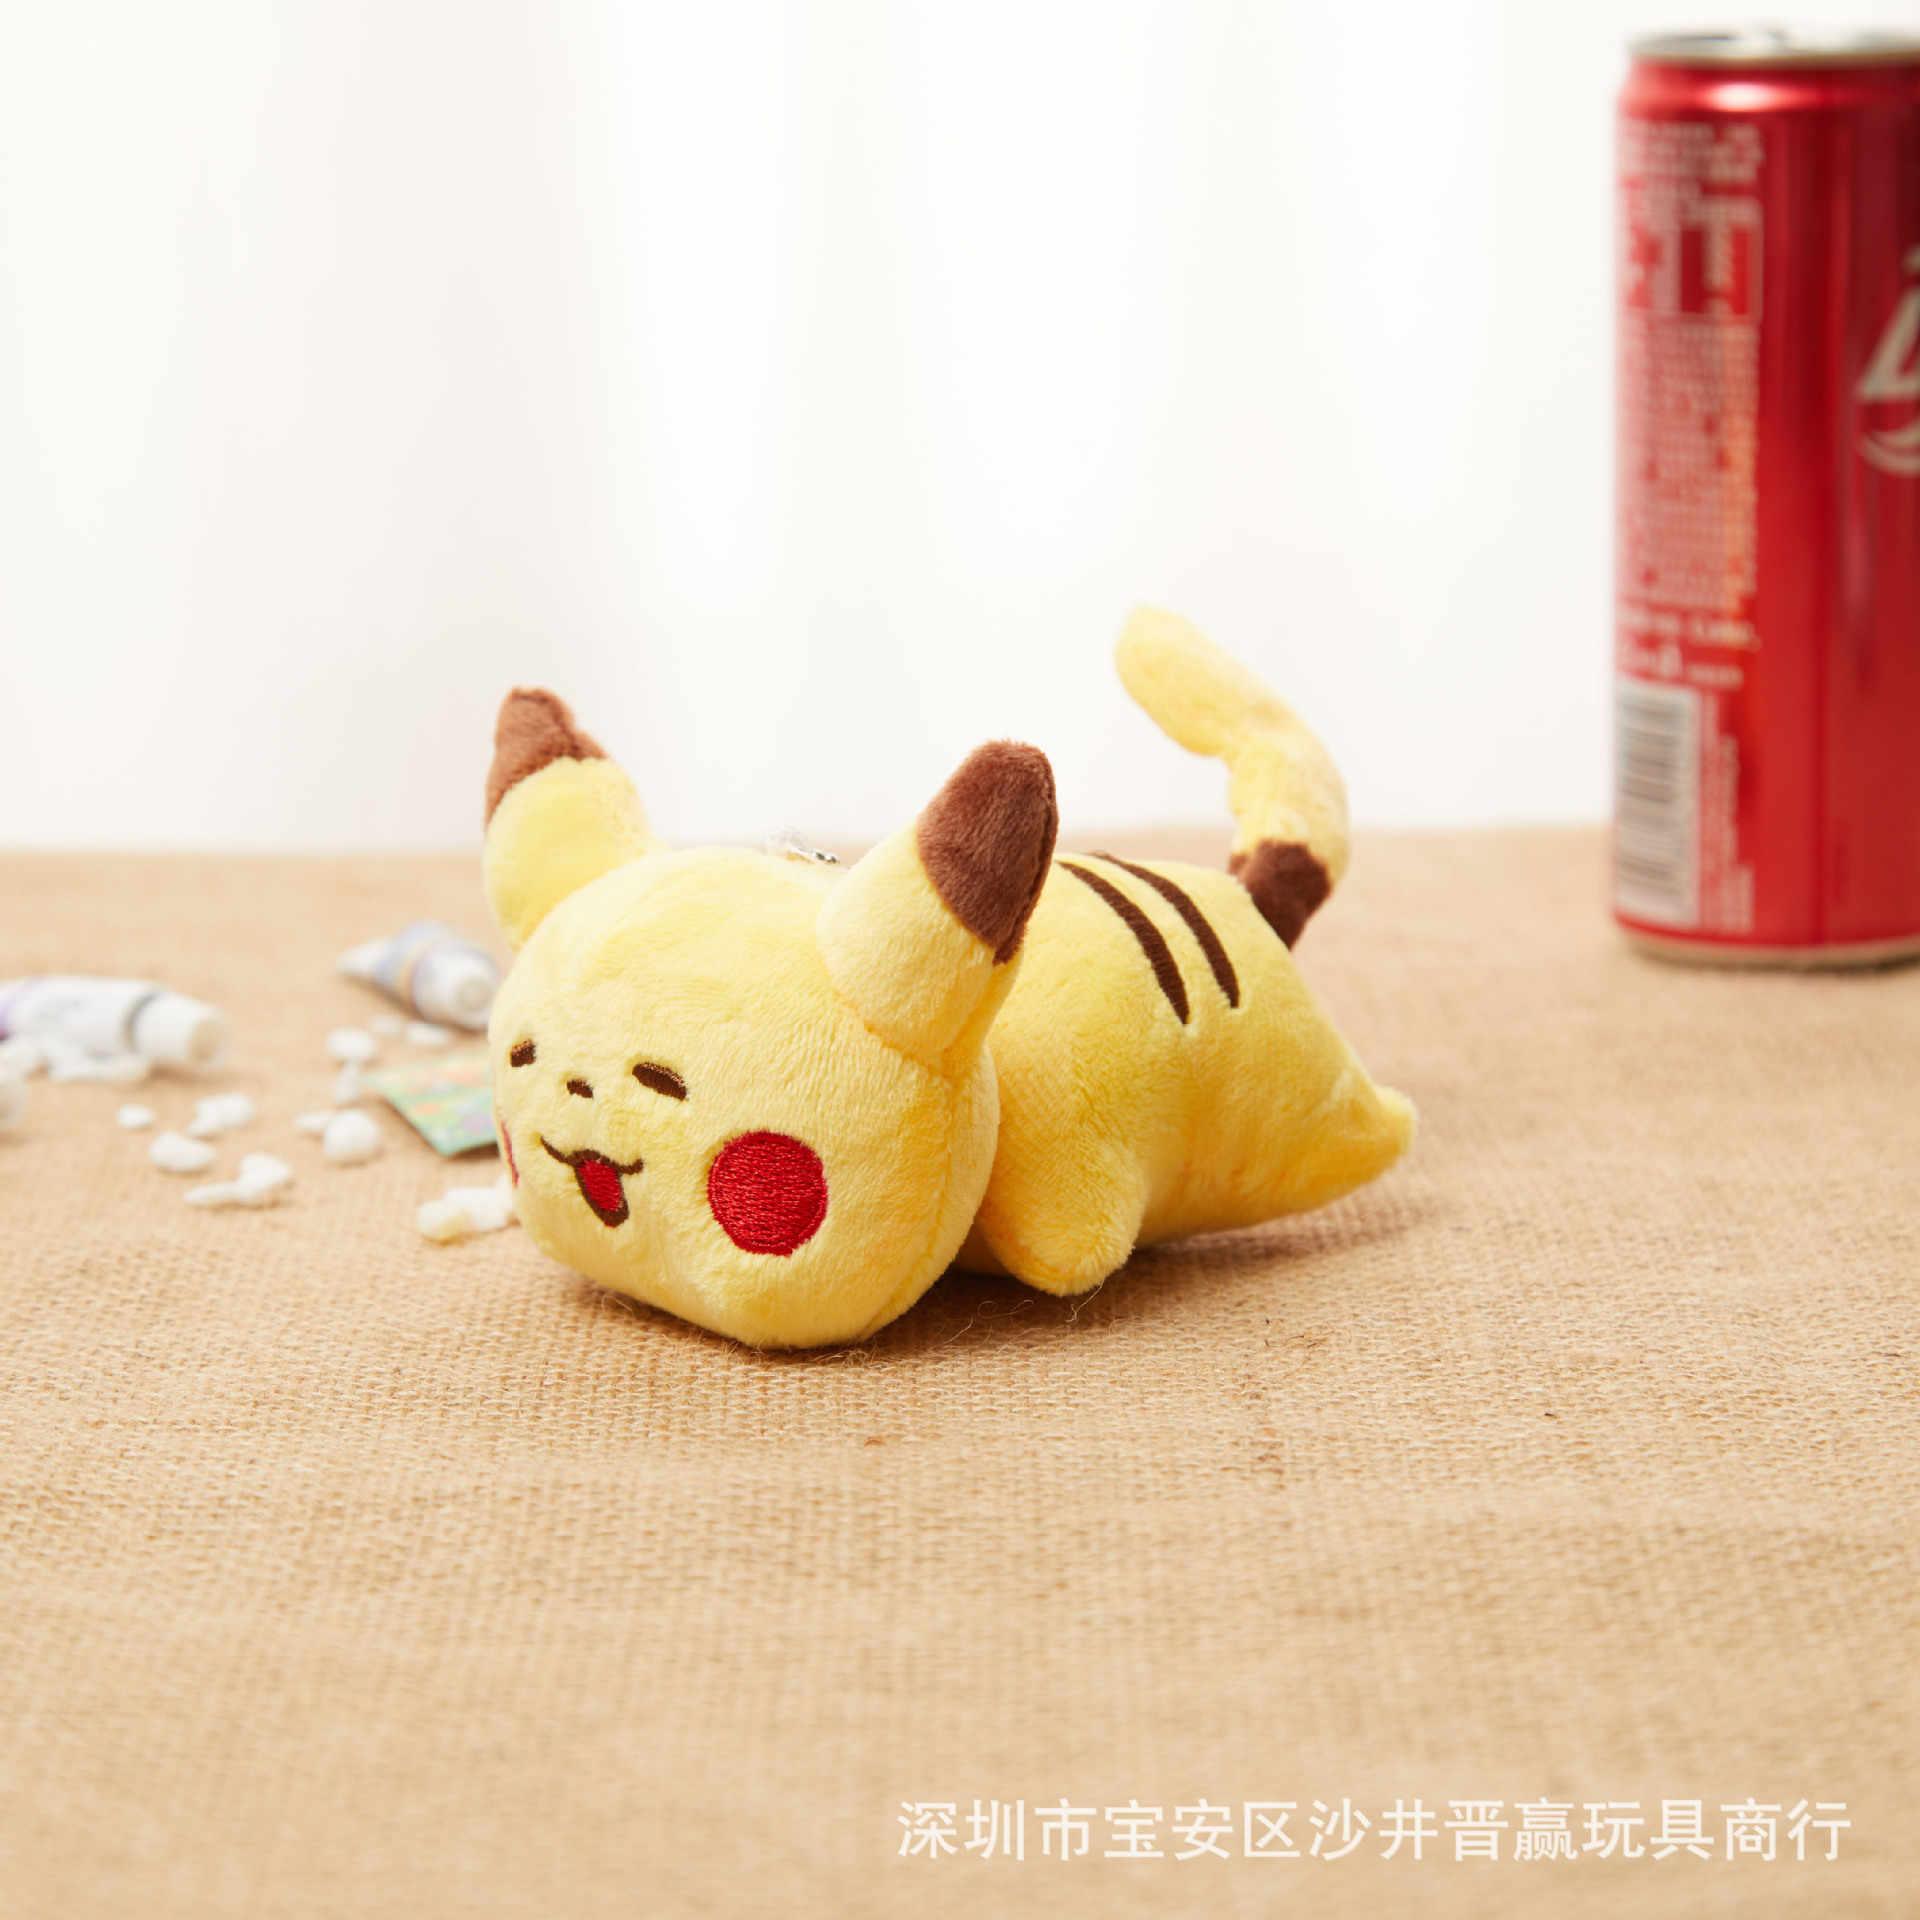 Pokemon 12 ซม.พ็อกเก็ตมอนสเตอร์พวงกุญแจจี้ Pikachu Charmander Squirtle Bulbasaur ตุ๊กตาตุ๊กตา Plush ของขวัญของเล่นเด็กเด็ก